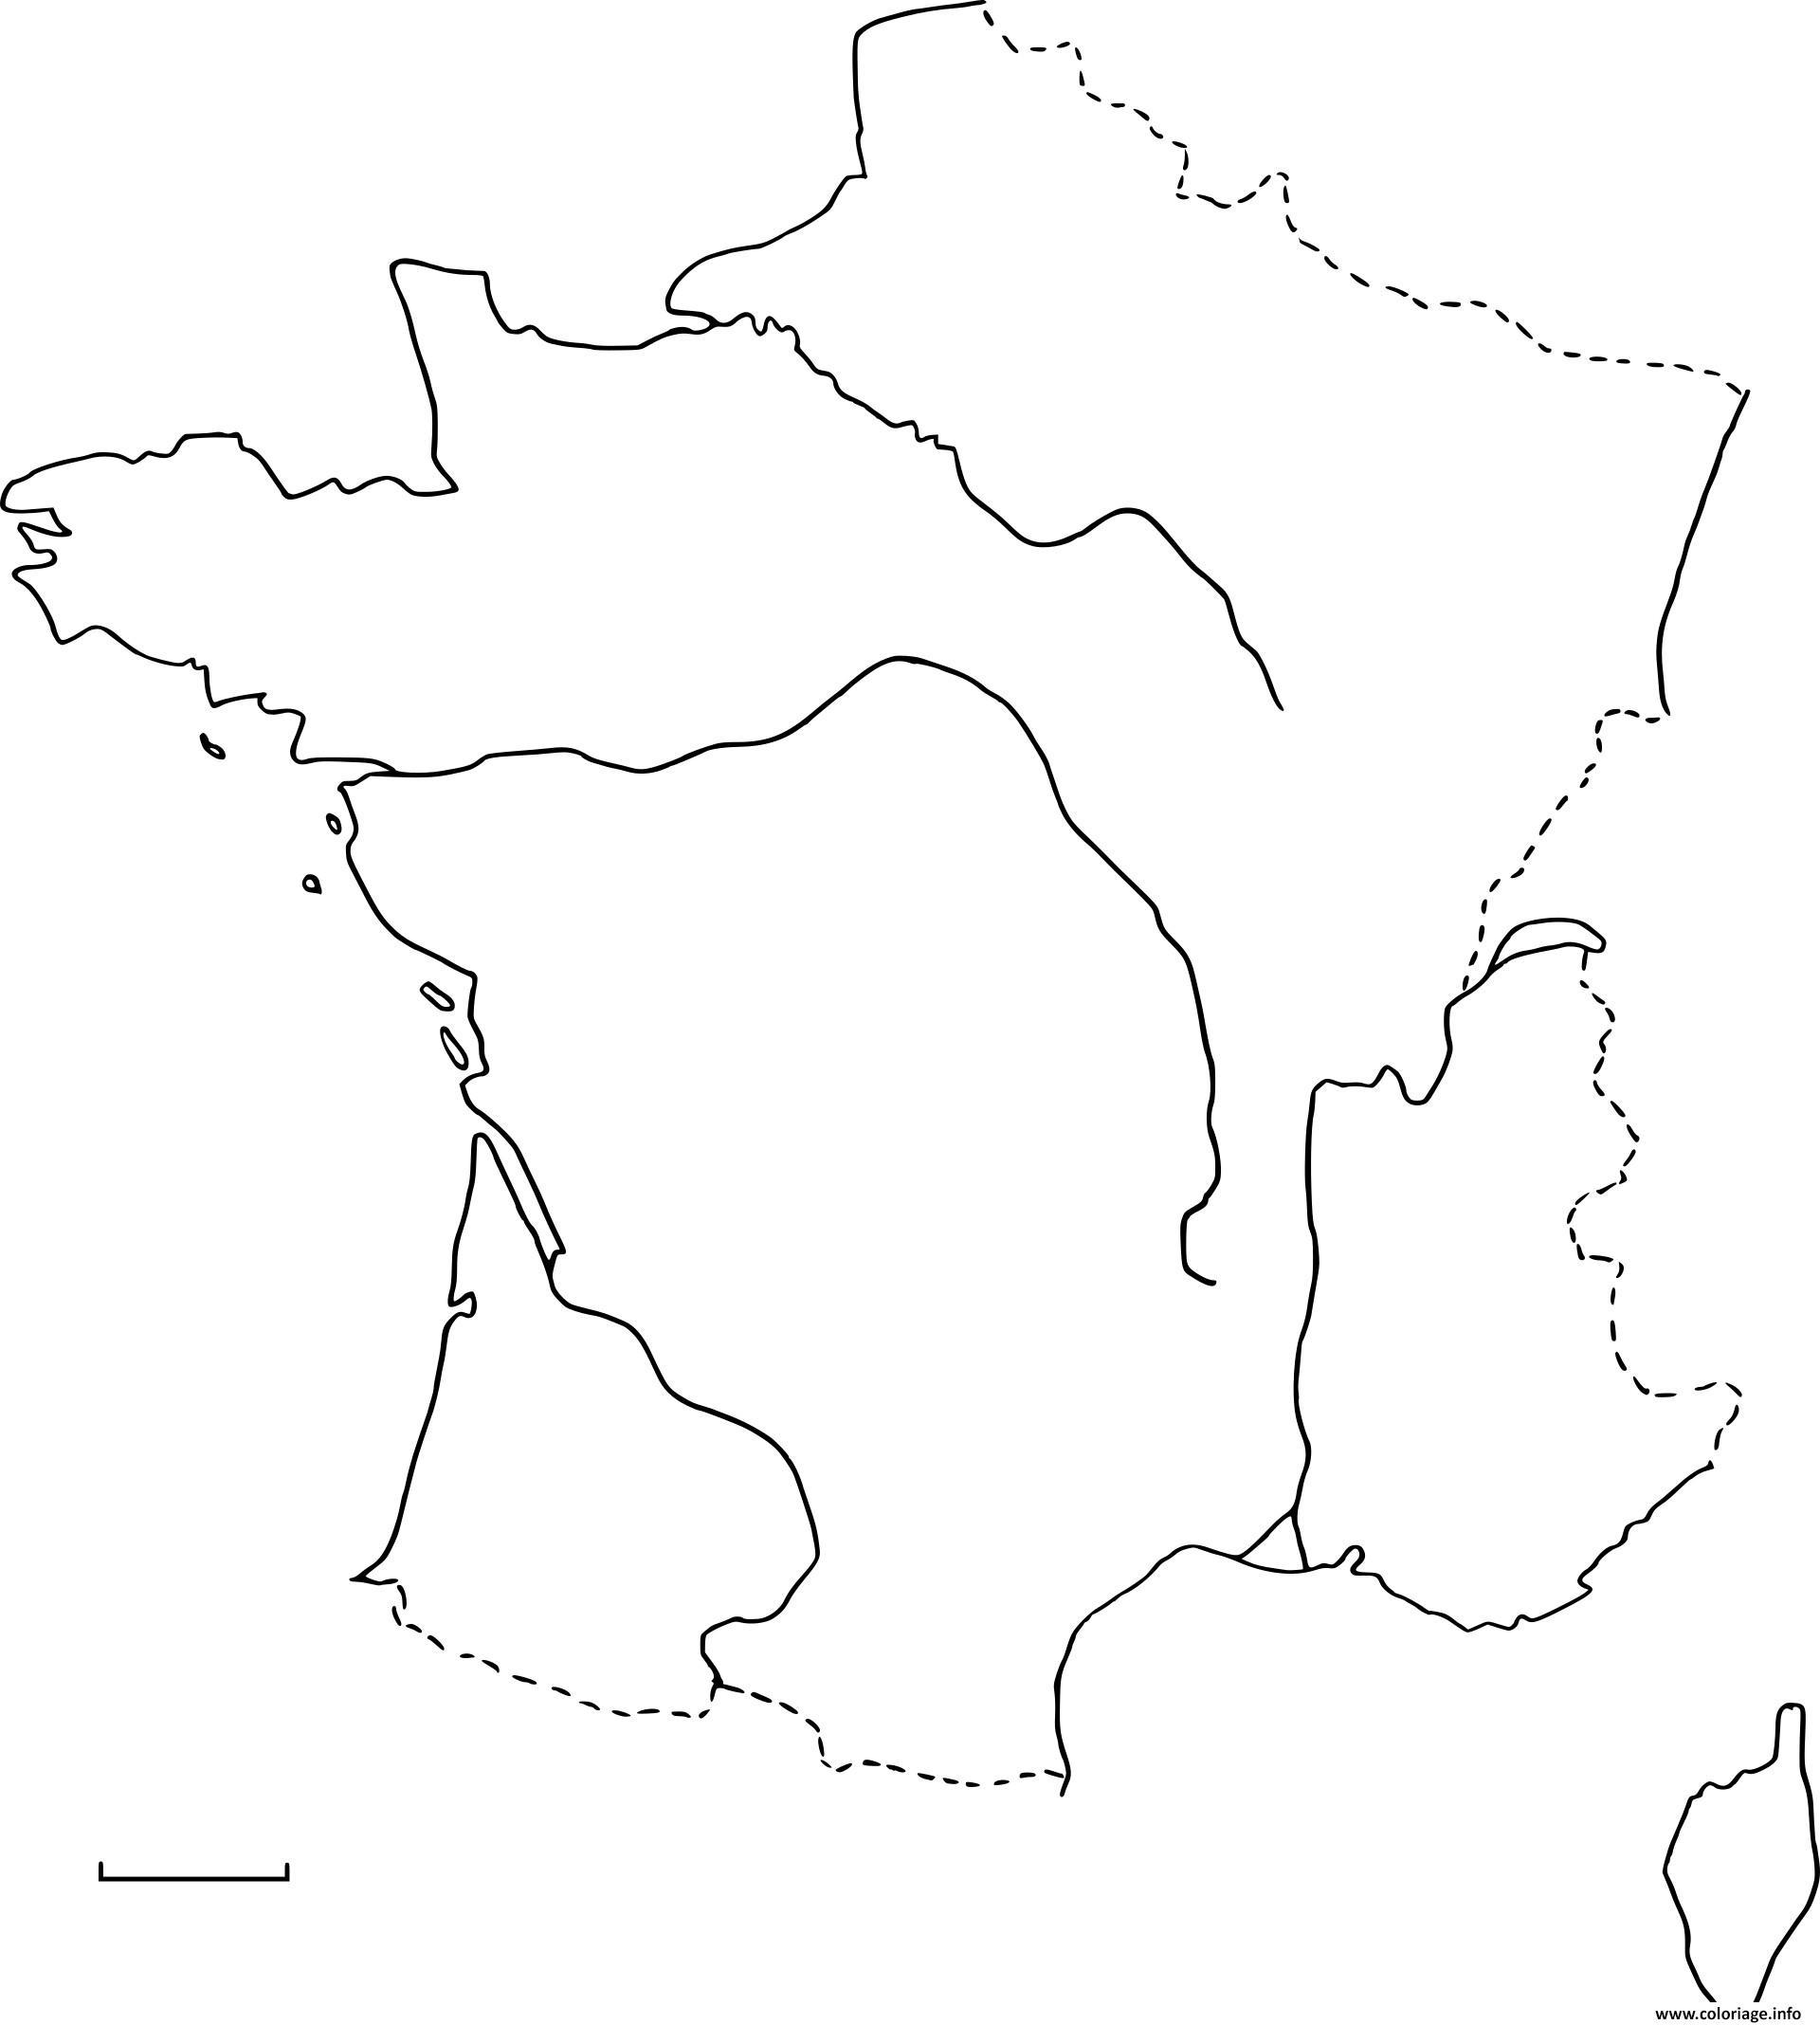 Coloriage Carte De France Vierge Dessin destiné Dessin De Carte De France